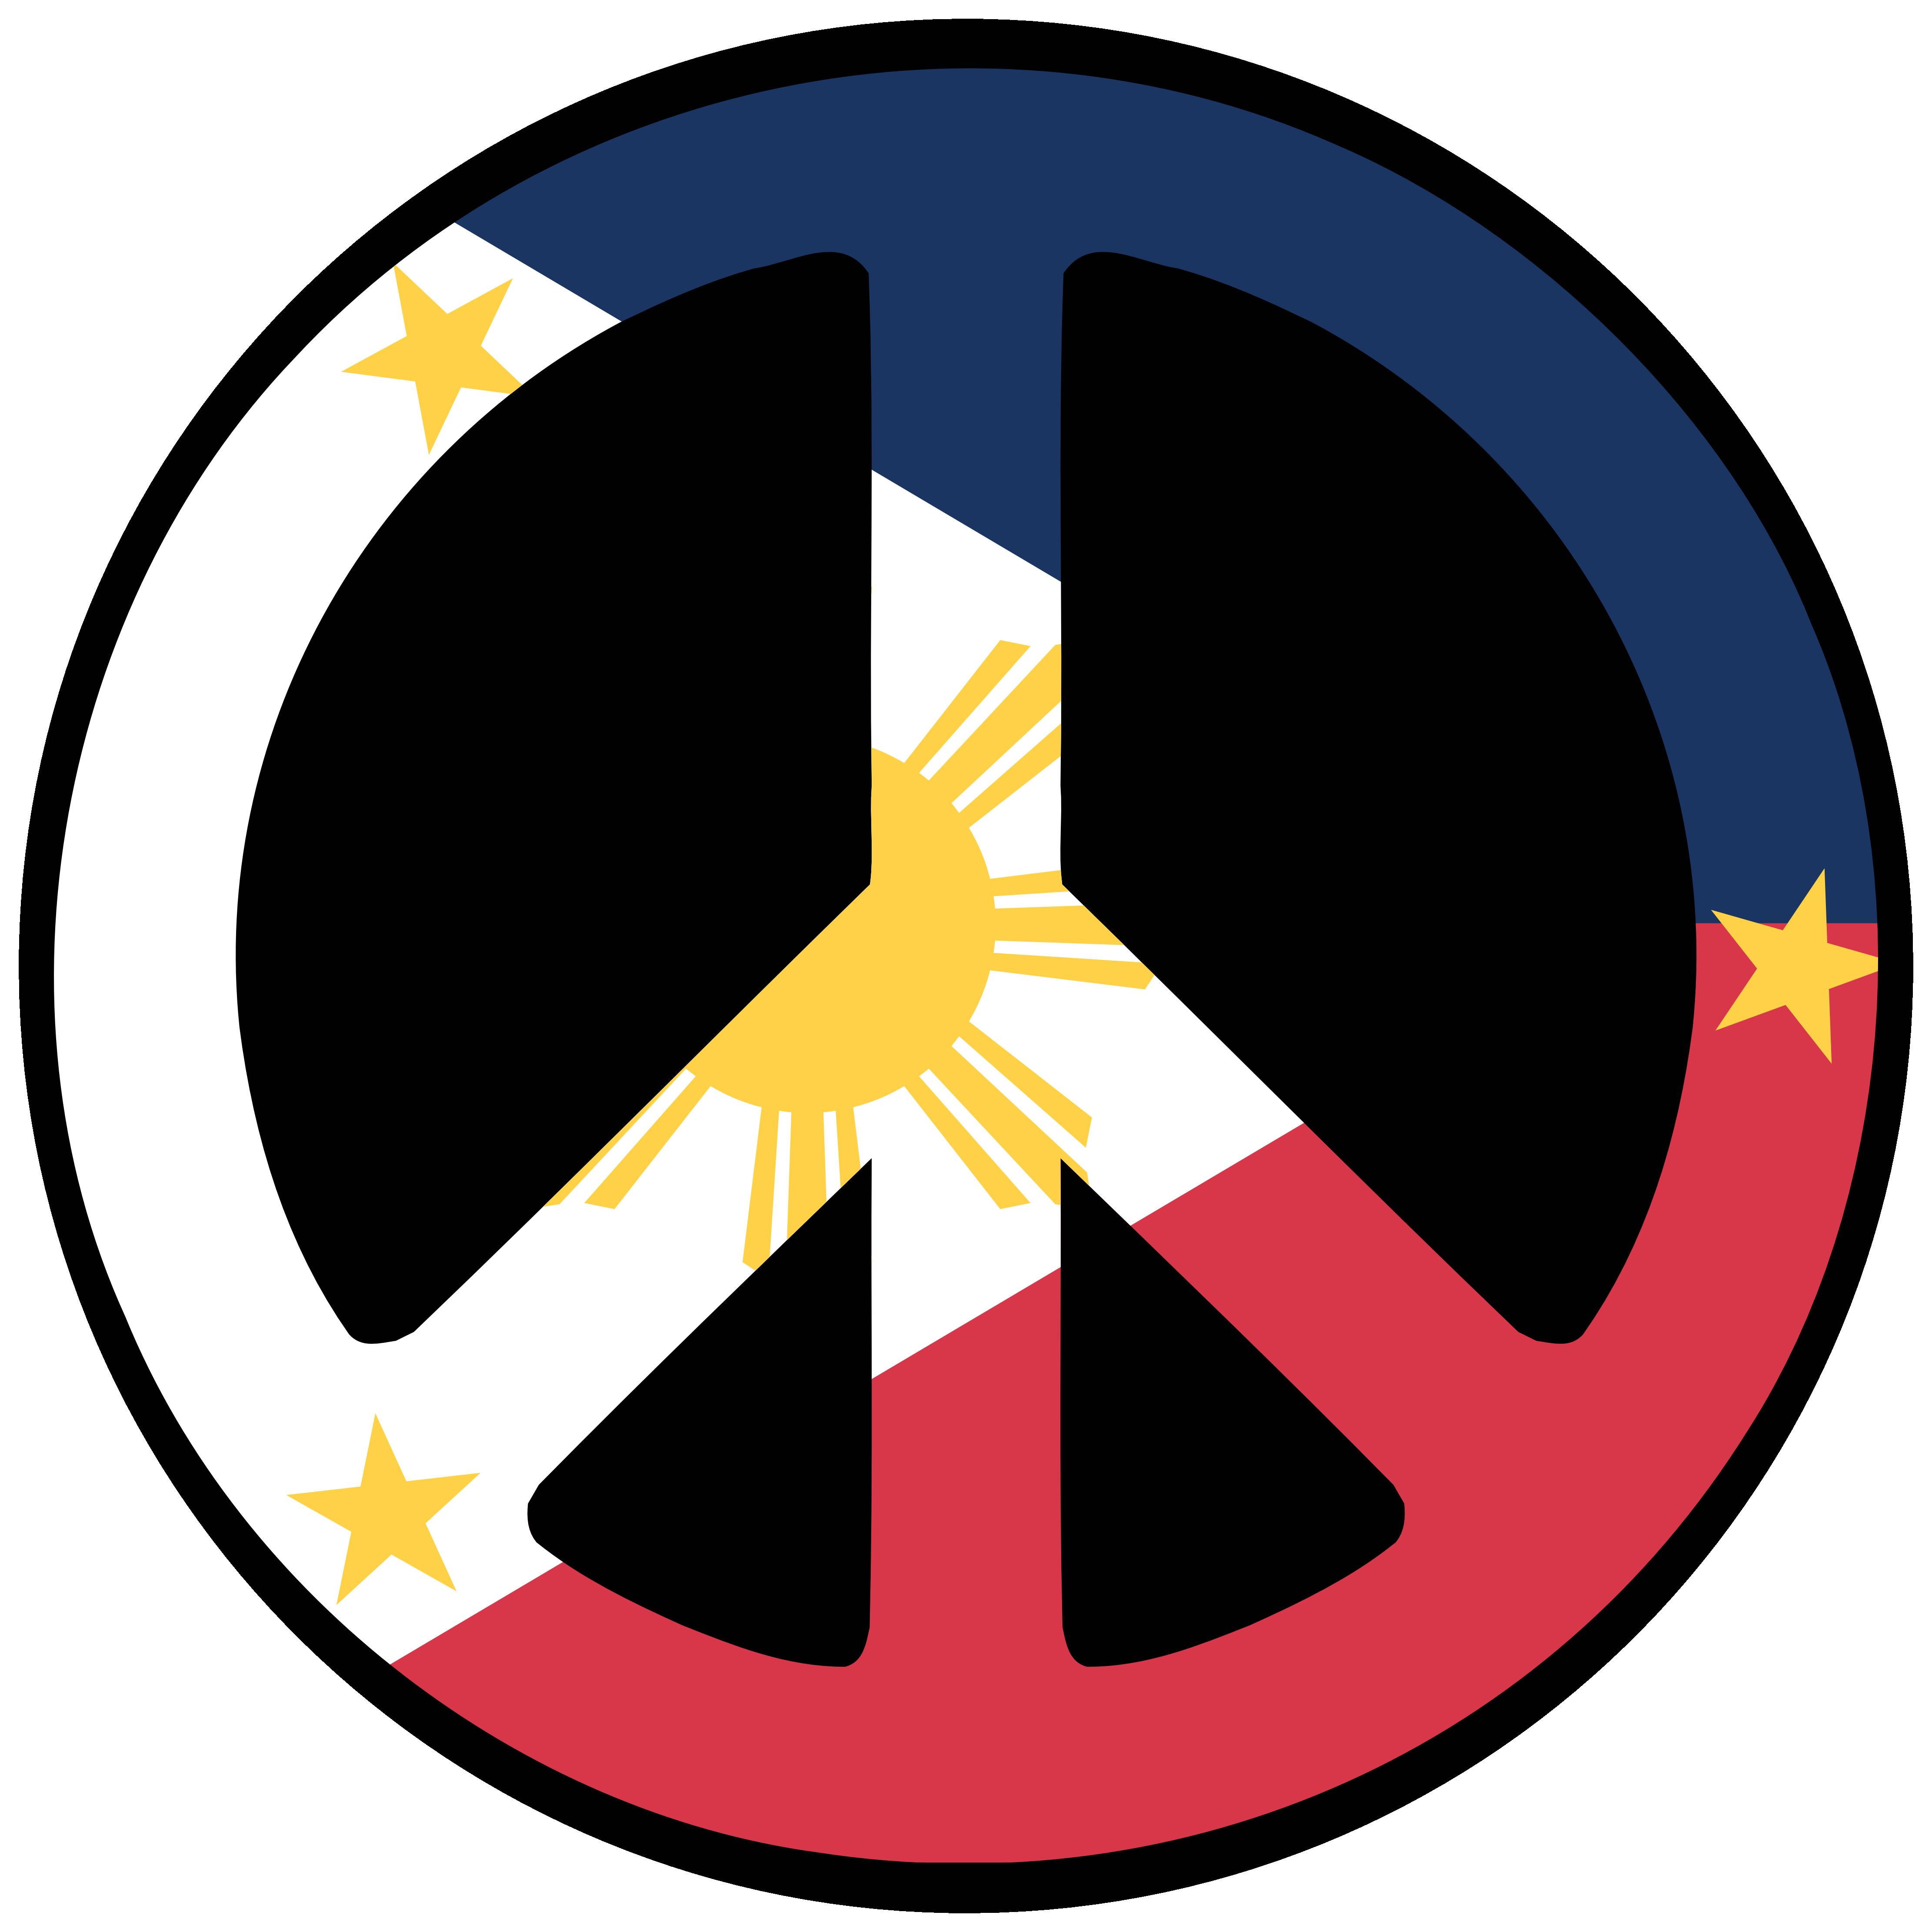 Philippines peace symbol flag peace 2 pinterest peace and philippines peace symbol flag buycottarizona Images